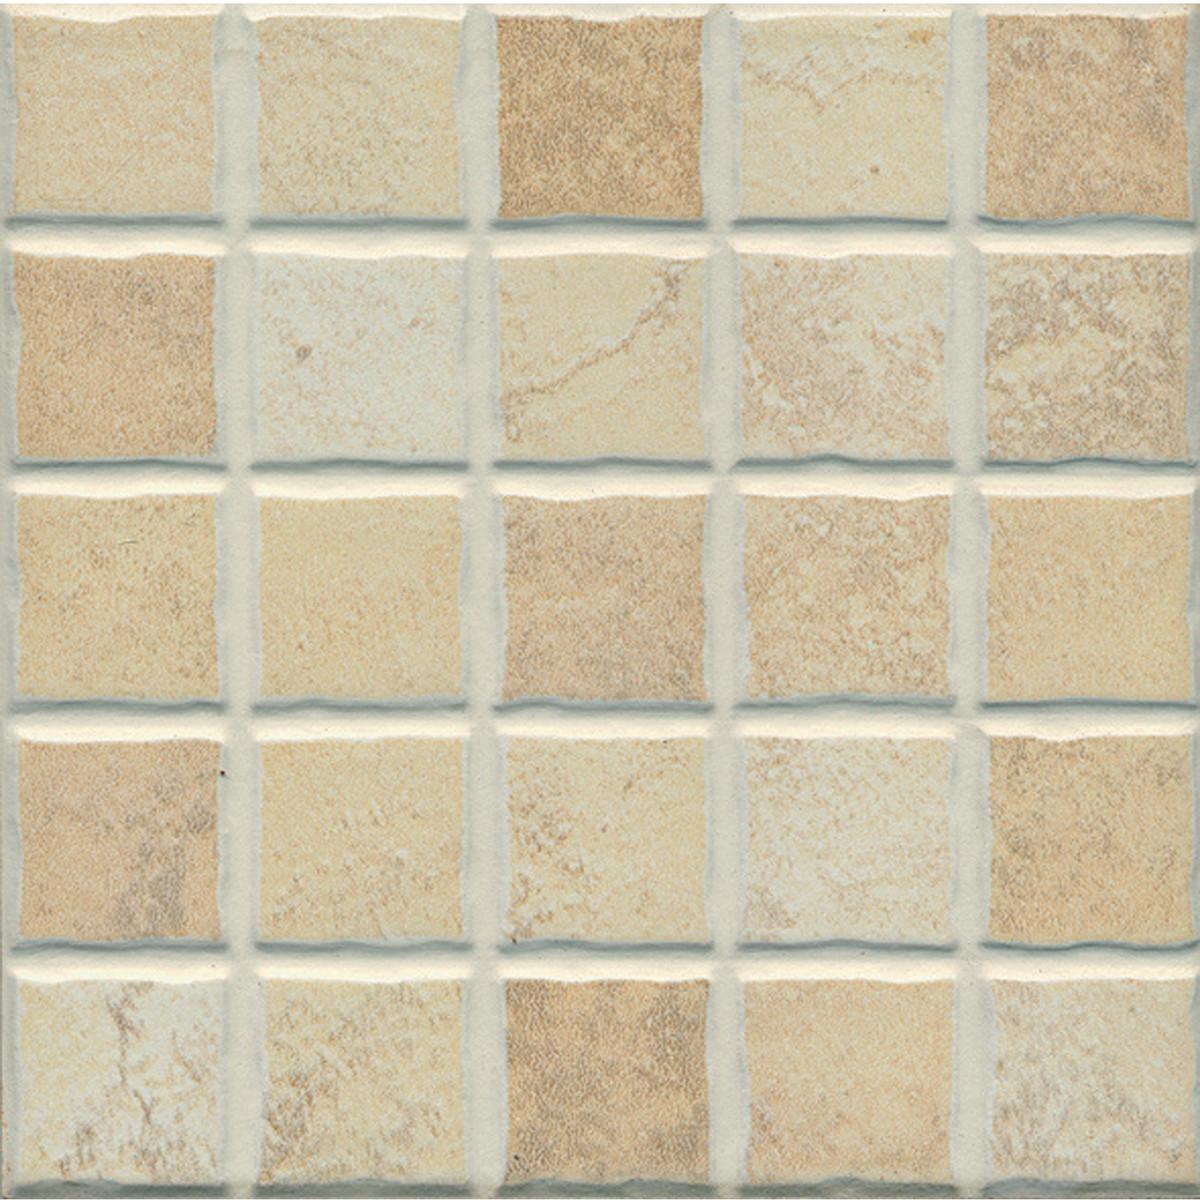 Awesome Mattonelle Mosaico Per Cucina Pictures - Home Interior ...